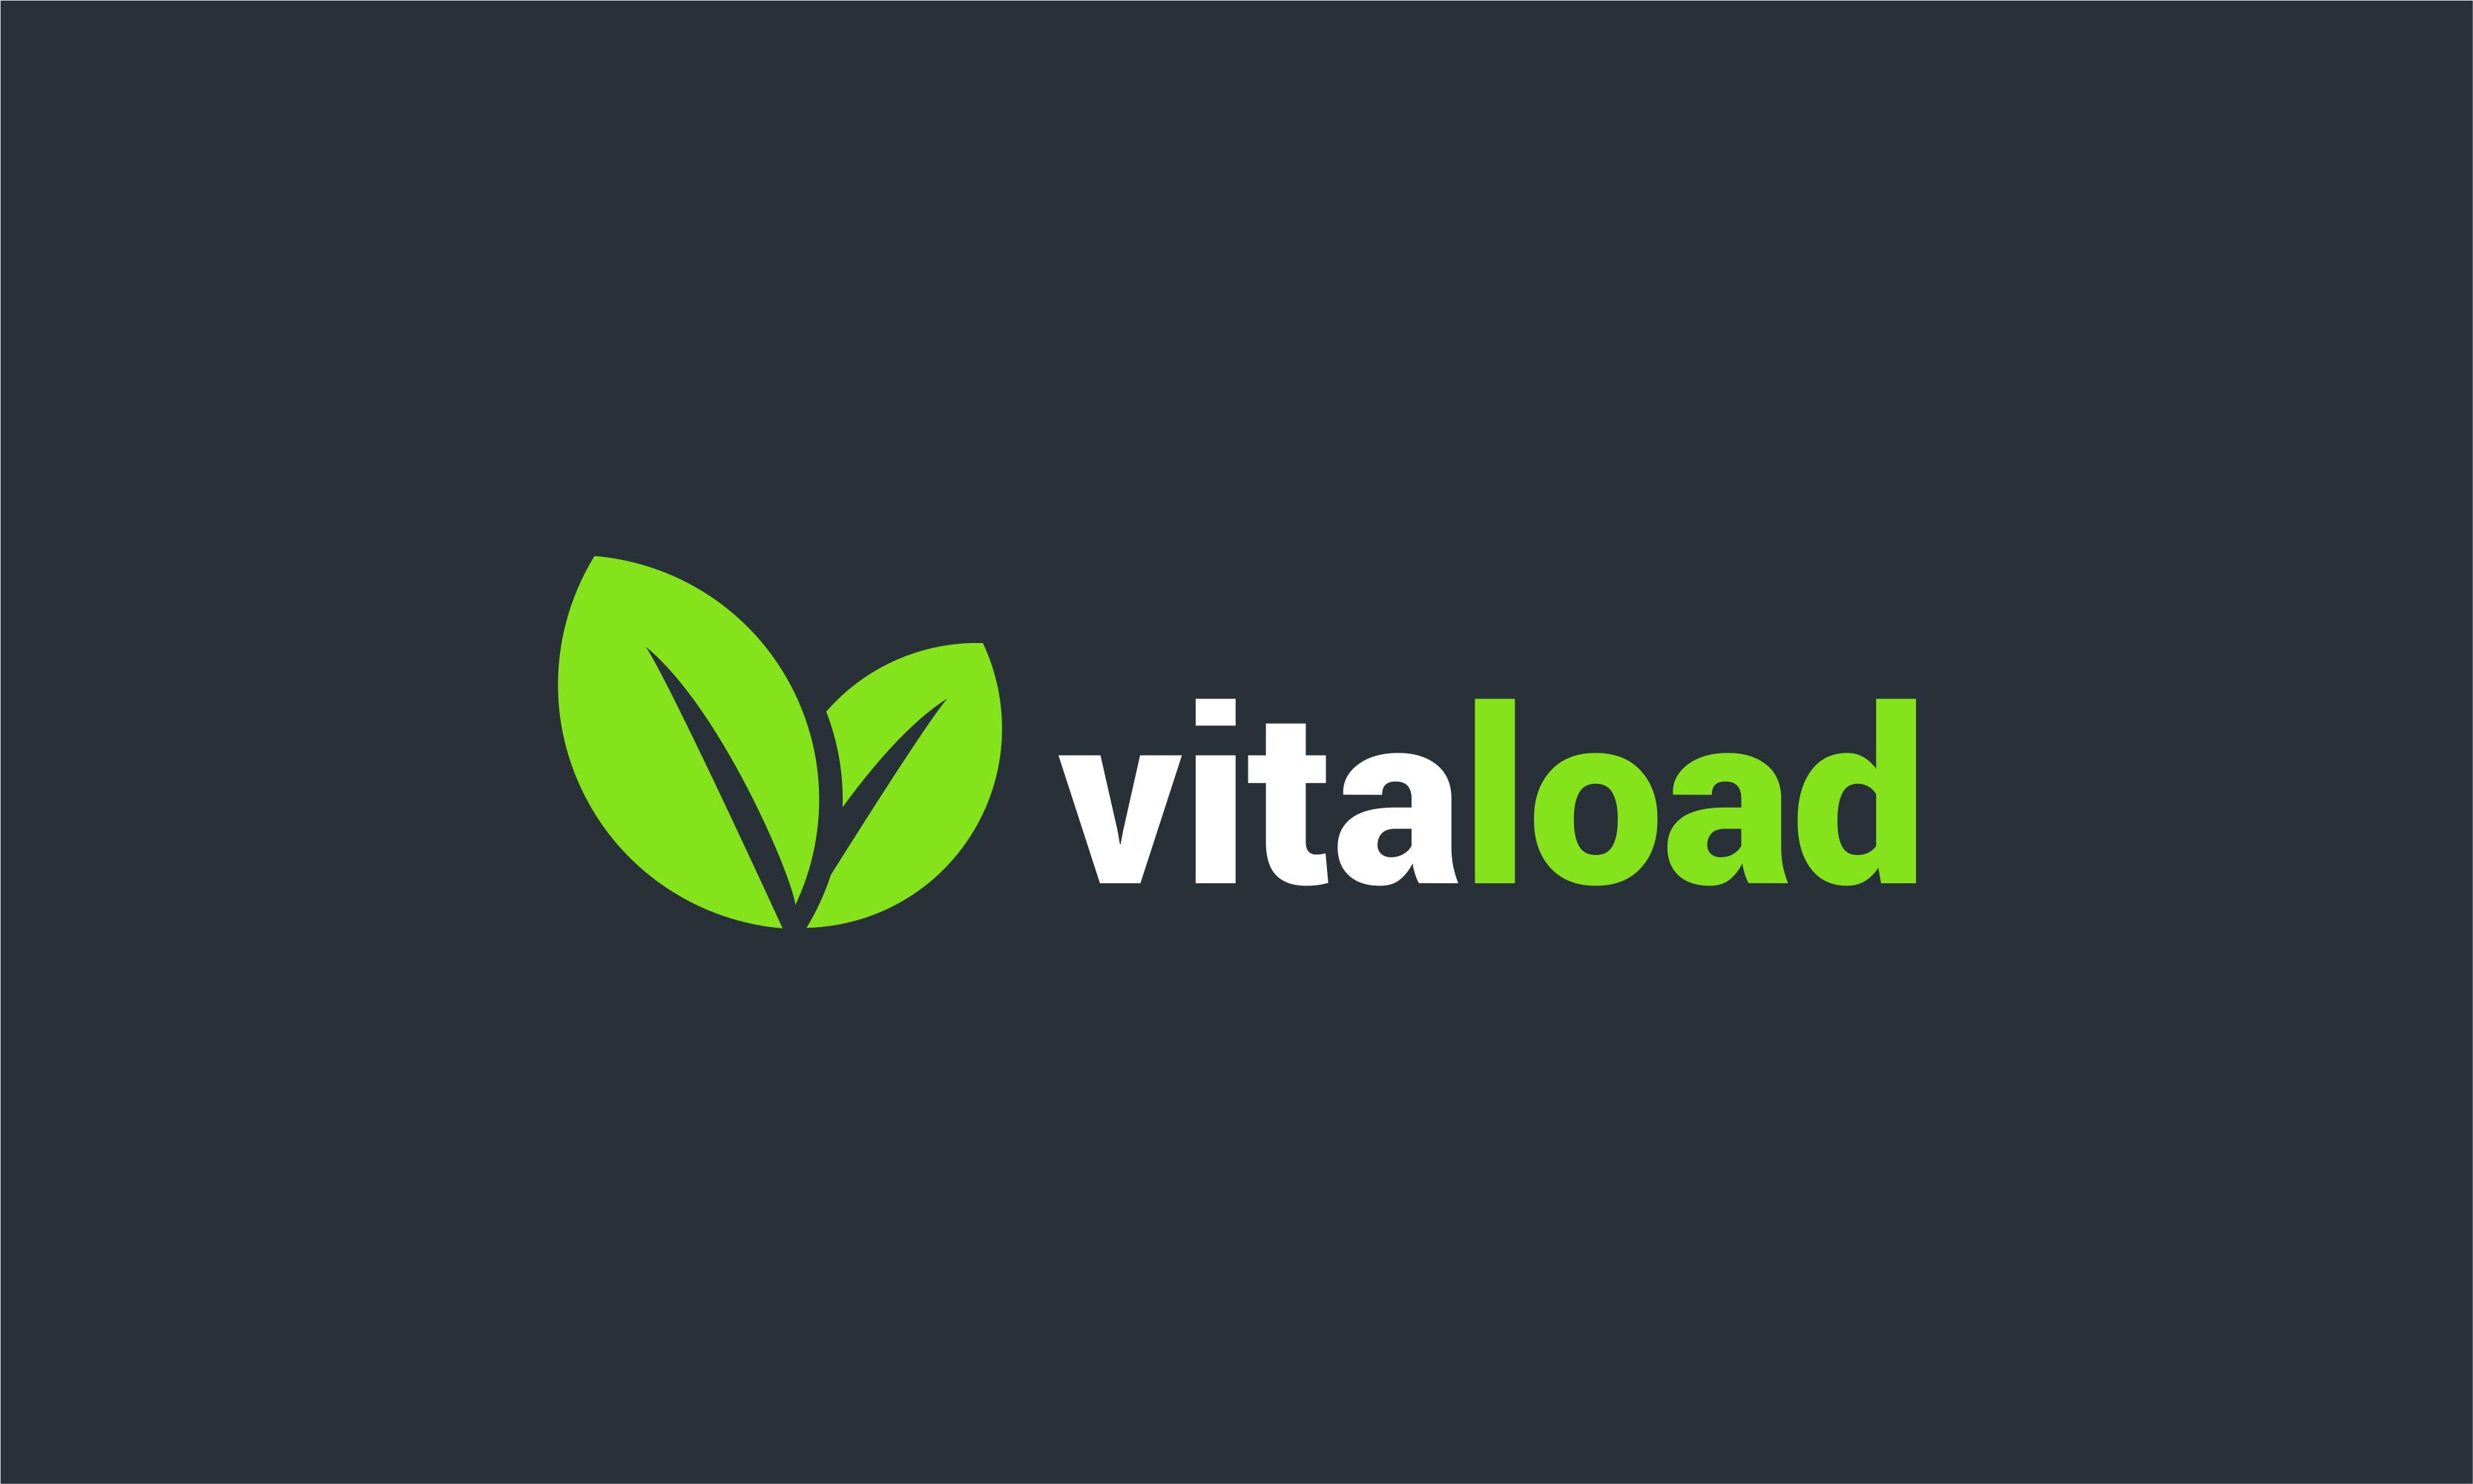 Vitaload